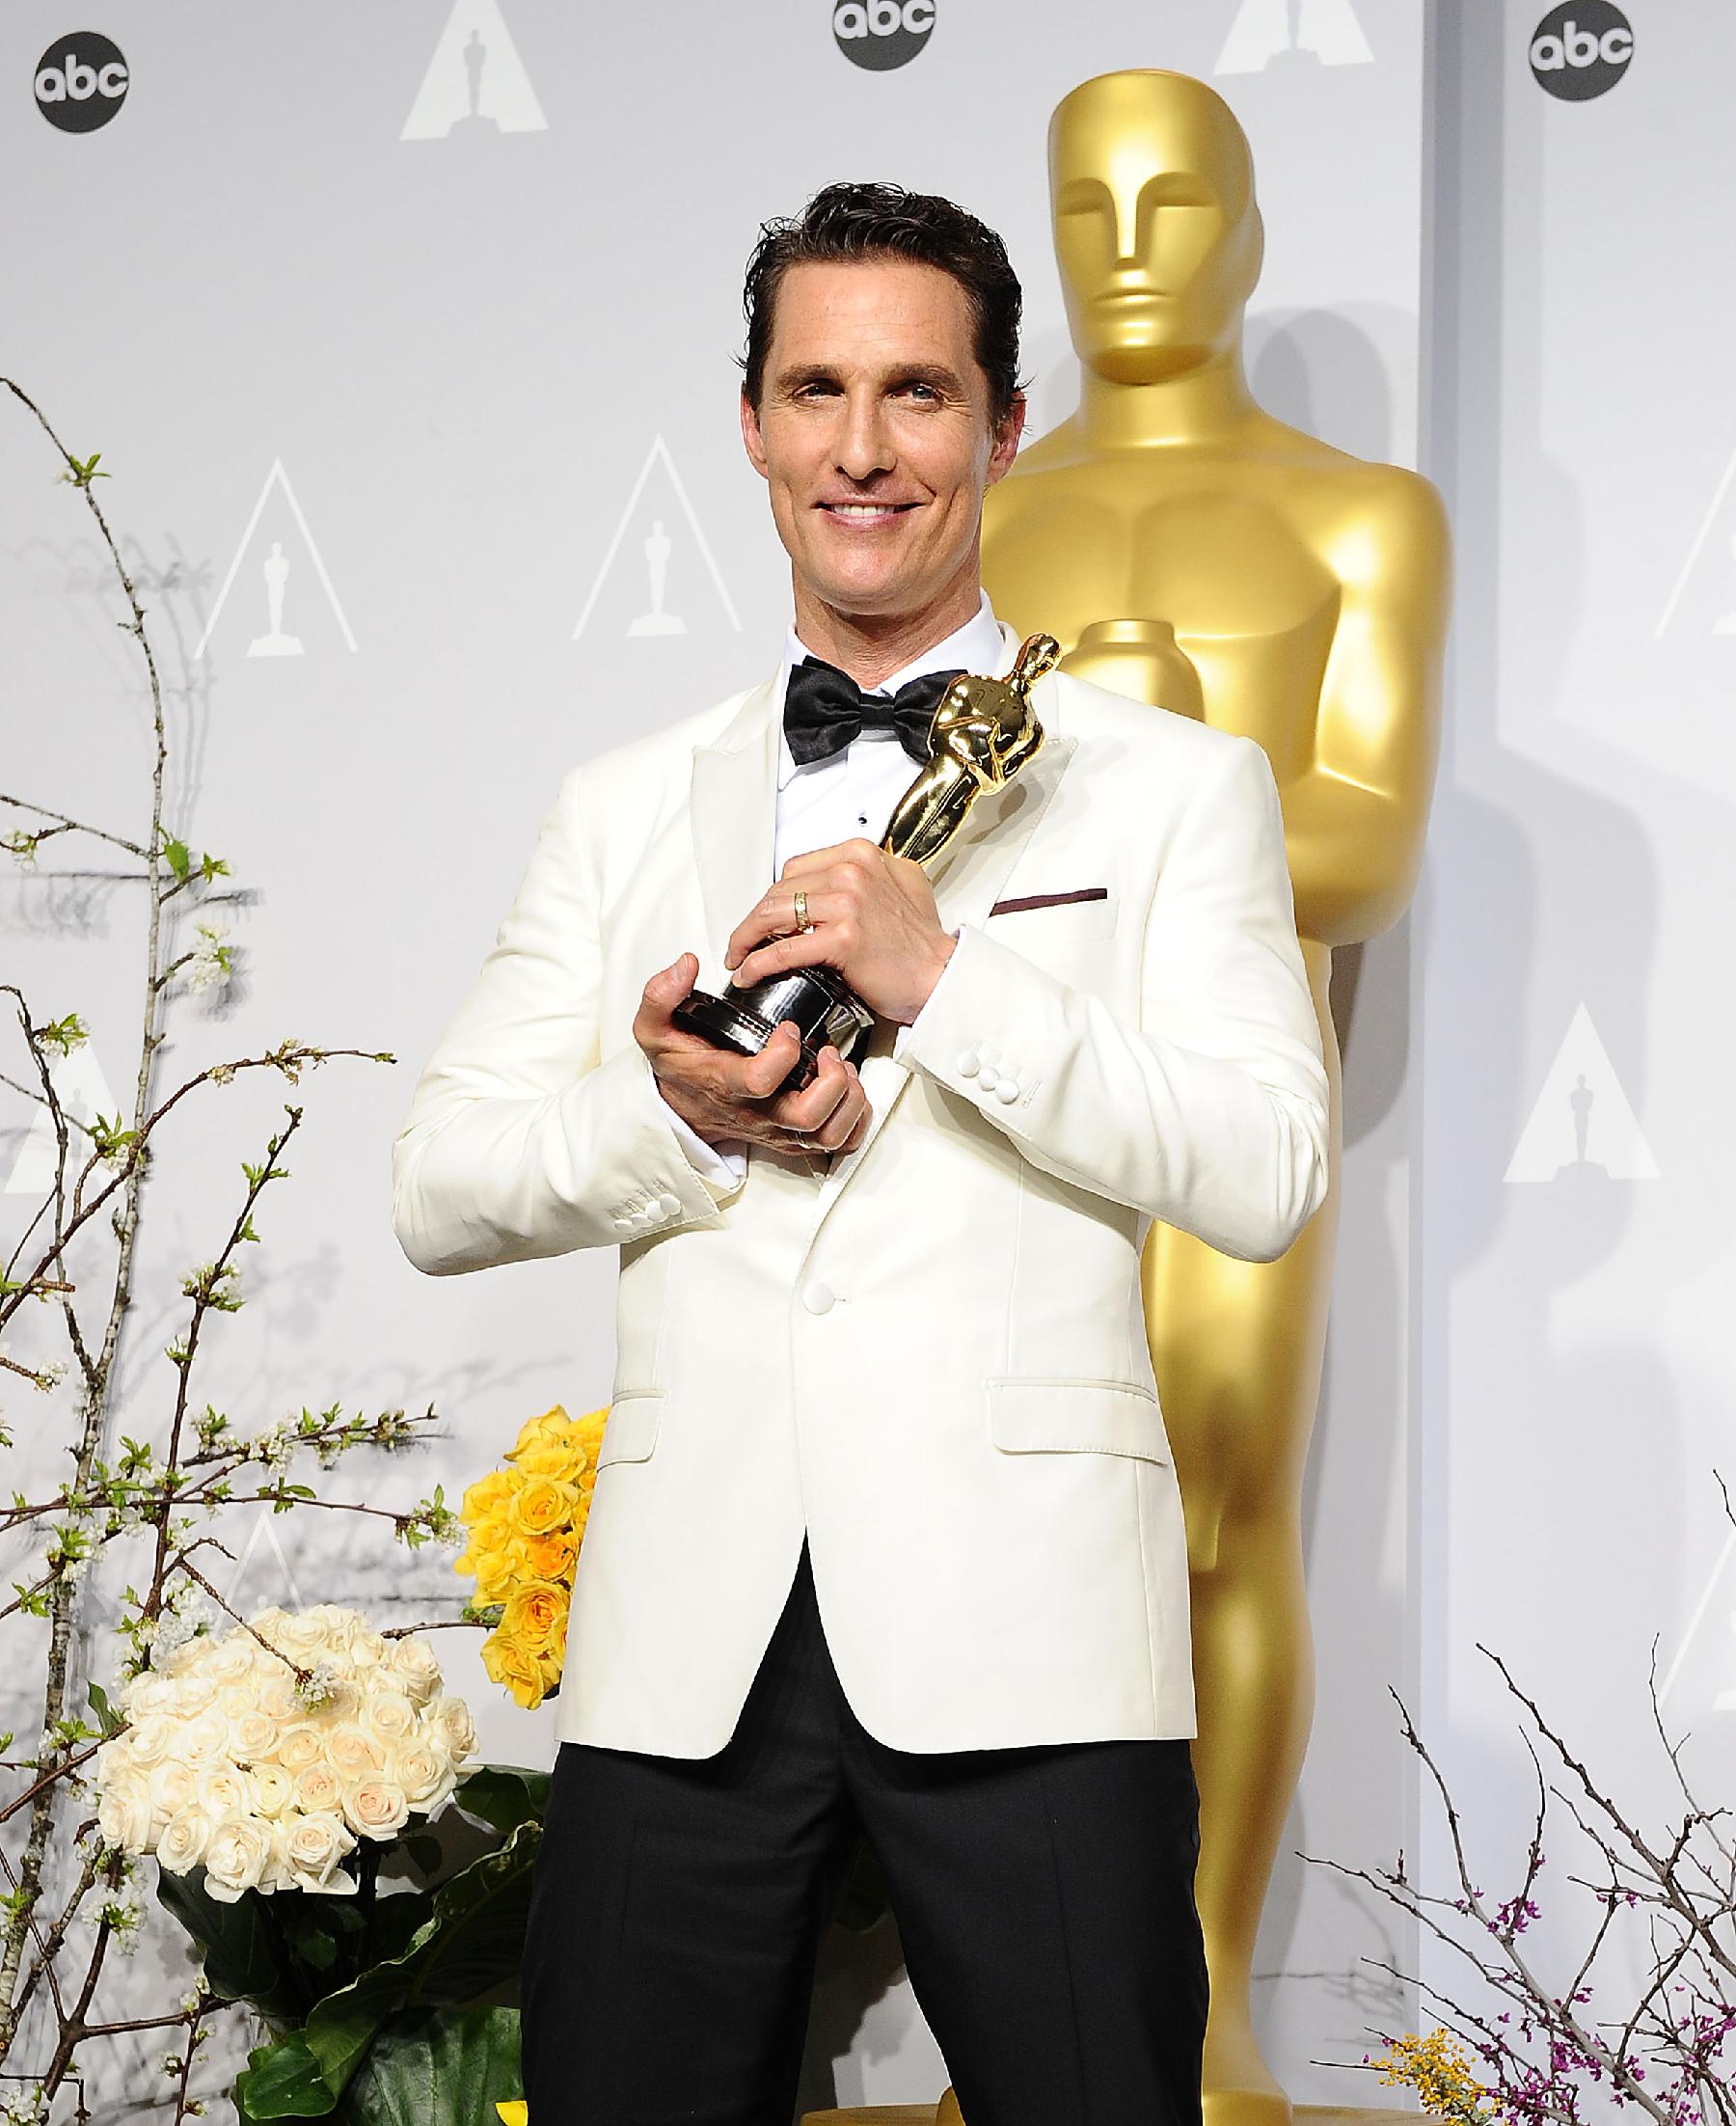 Matthew McConaughey on 'True Detective,' His Pal Woody, McConaissance